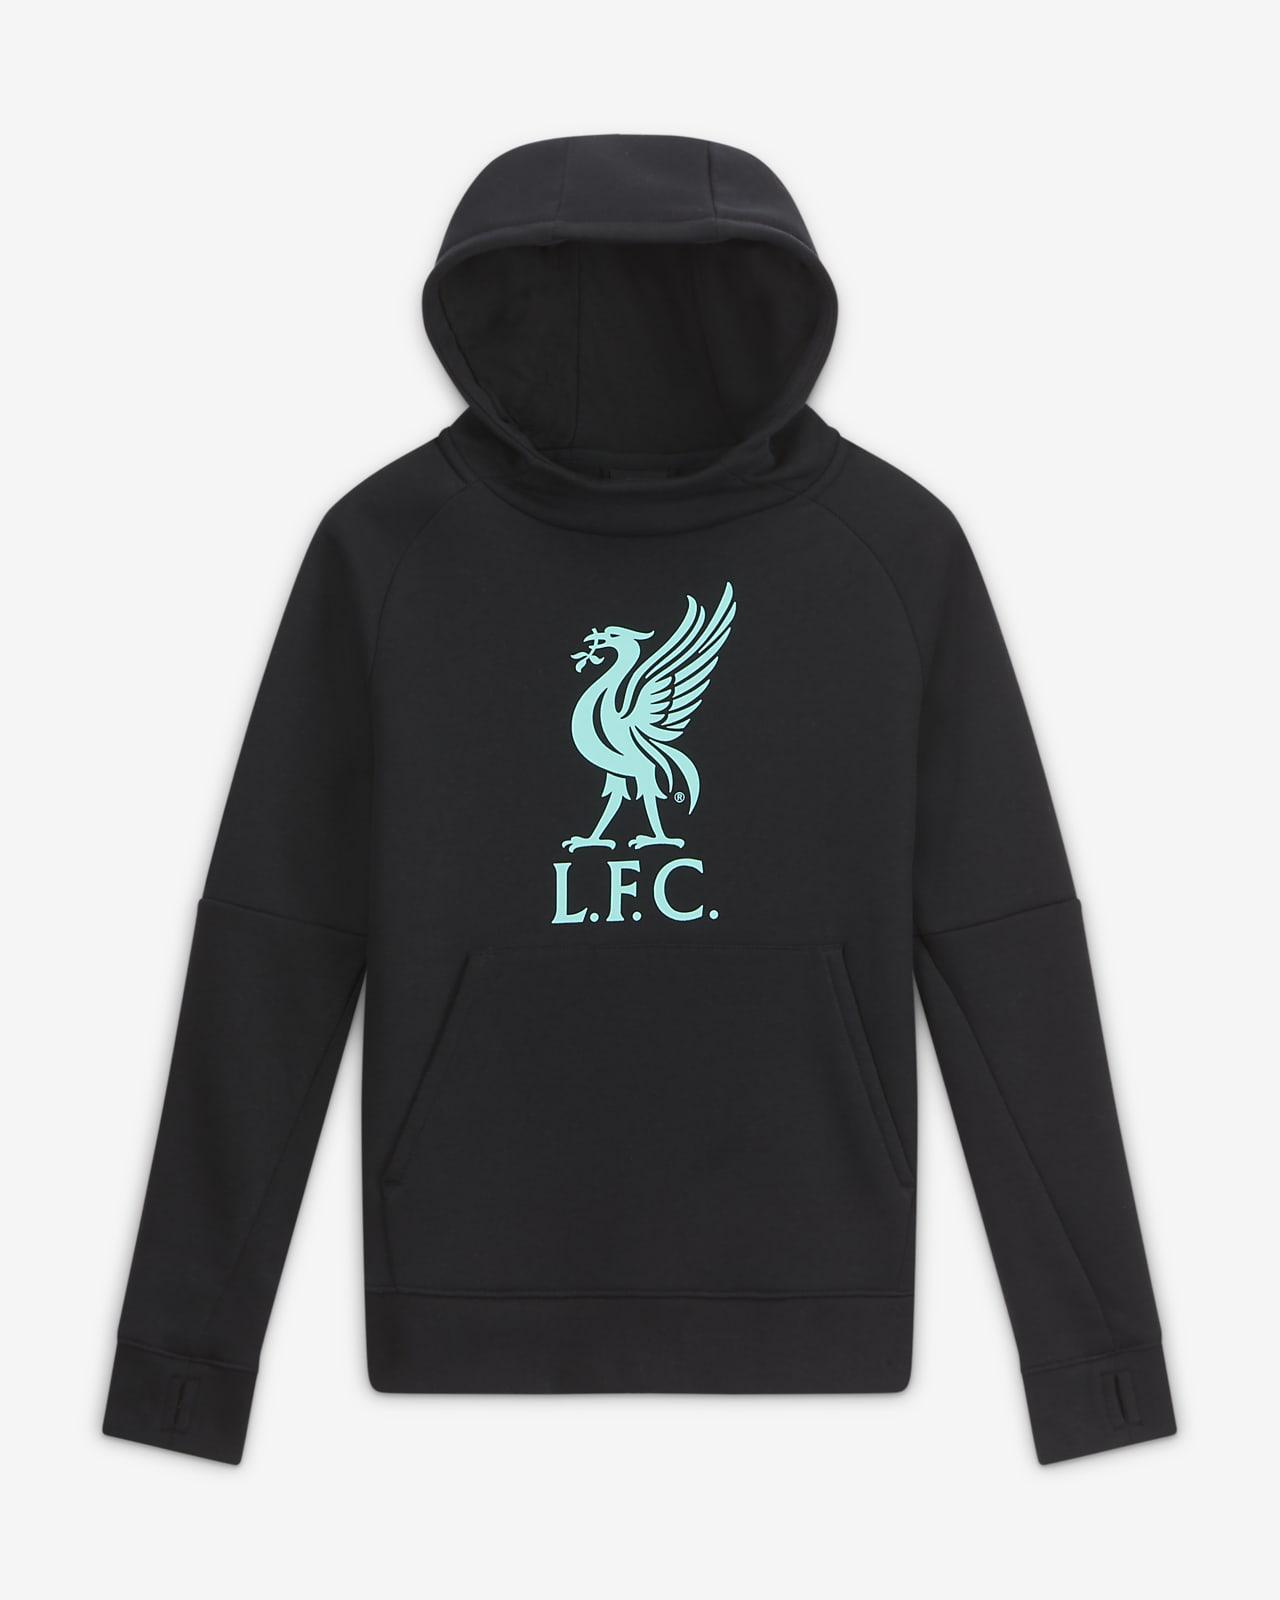 Liverpool F.C. Older Kids' Fleece Pullover Football Hoodie